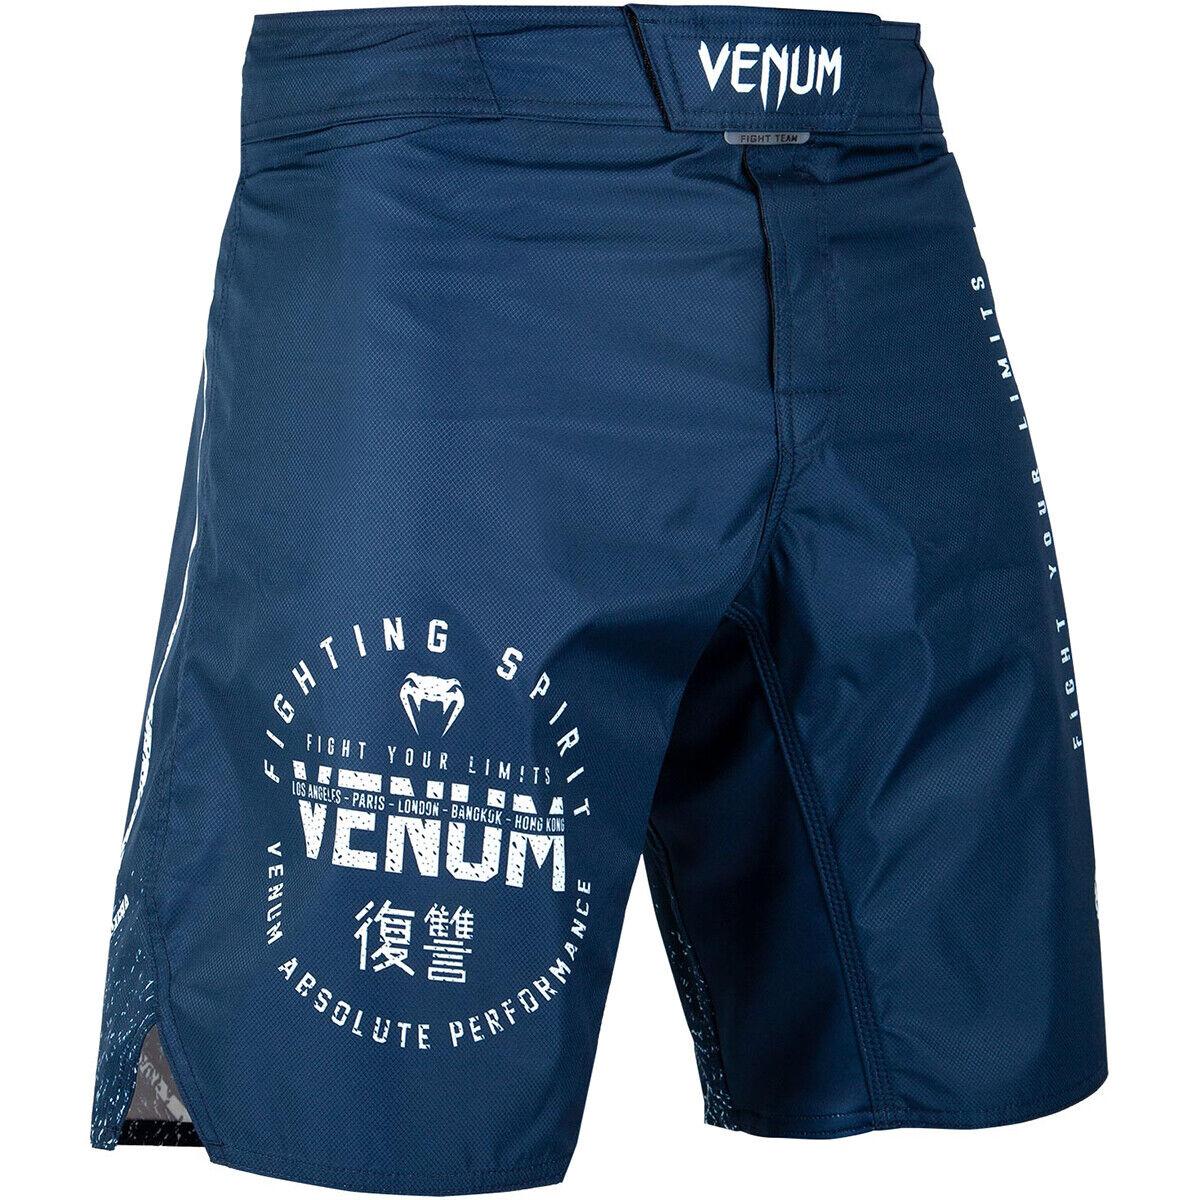 Venum  Signature MMA Fight Shorts - Navy bluee White  online